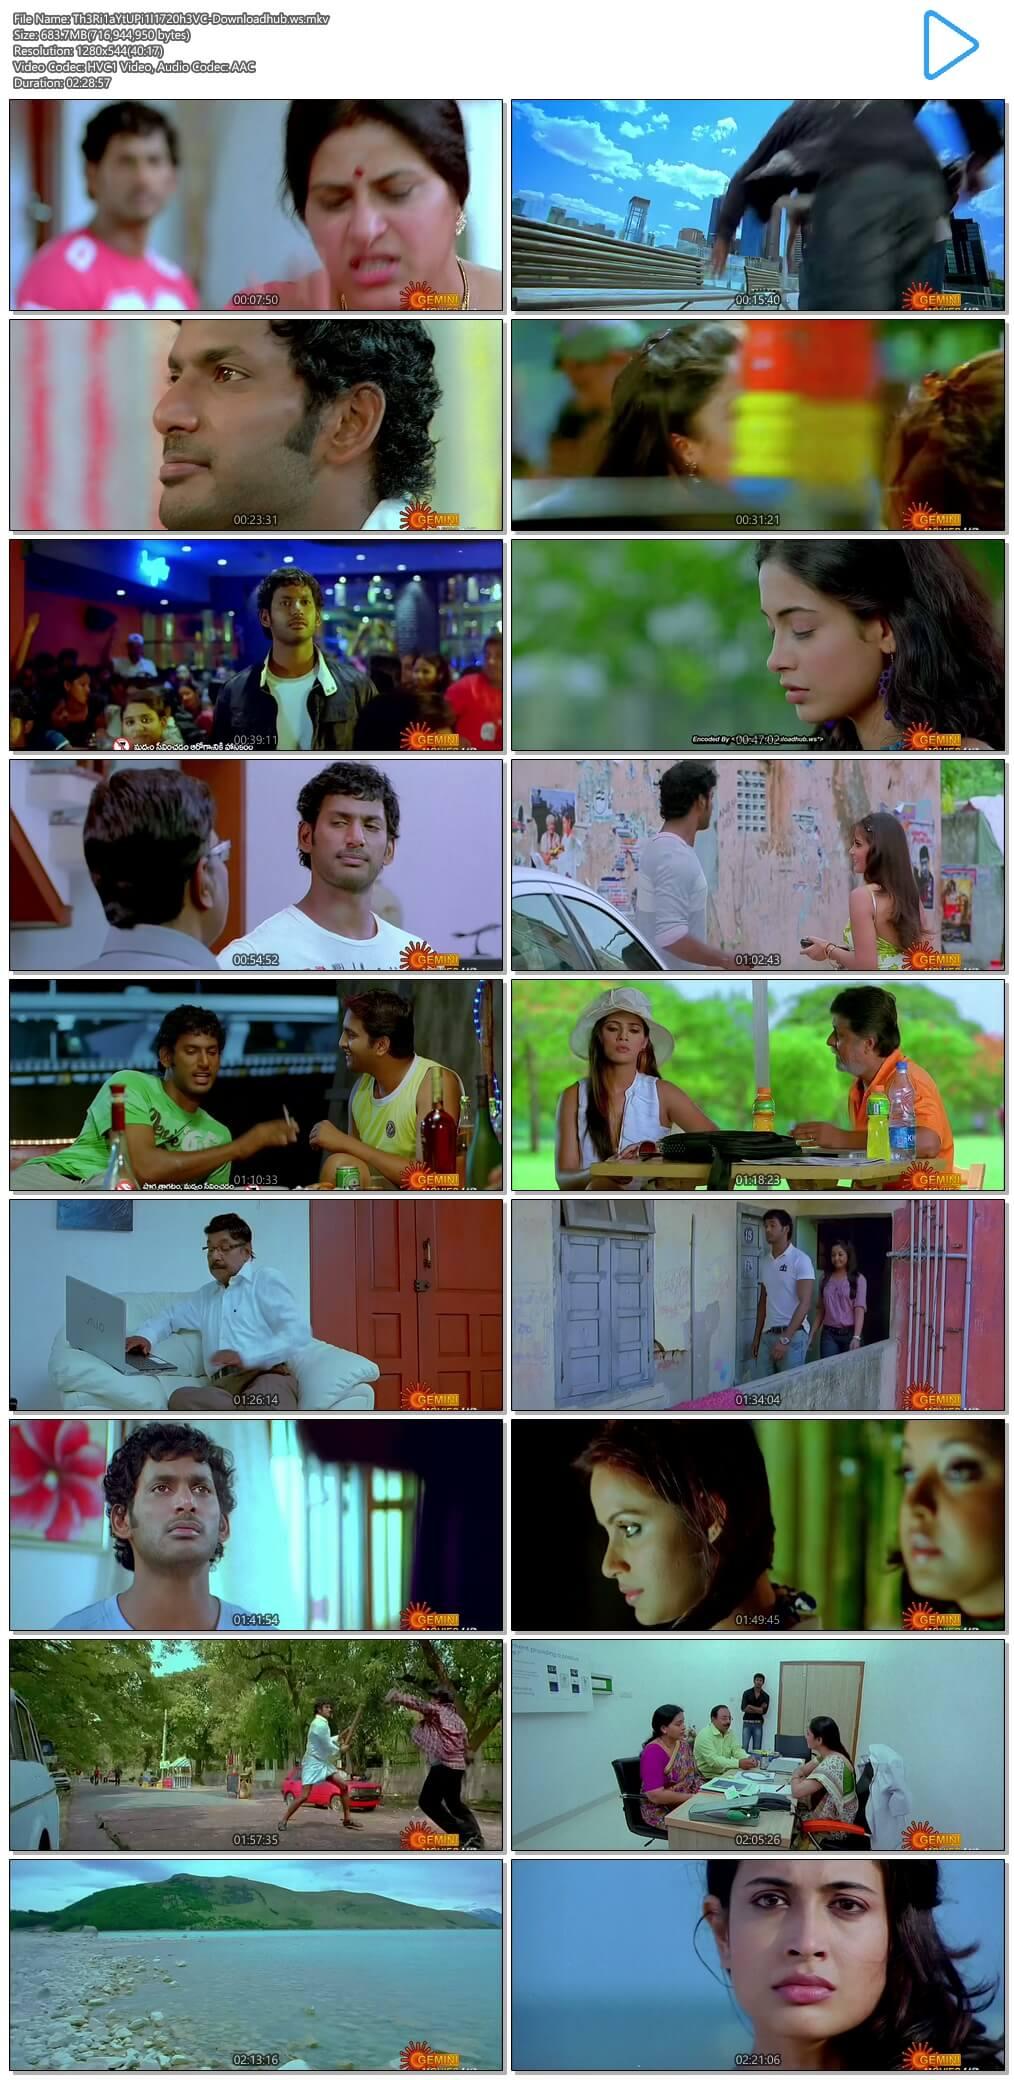 Theeradha Vilaiyattu Pillai 2010 UNCUT Hindi Dual Audio 720p HEVC HDRip Download